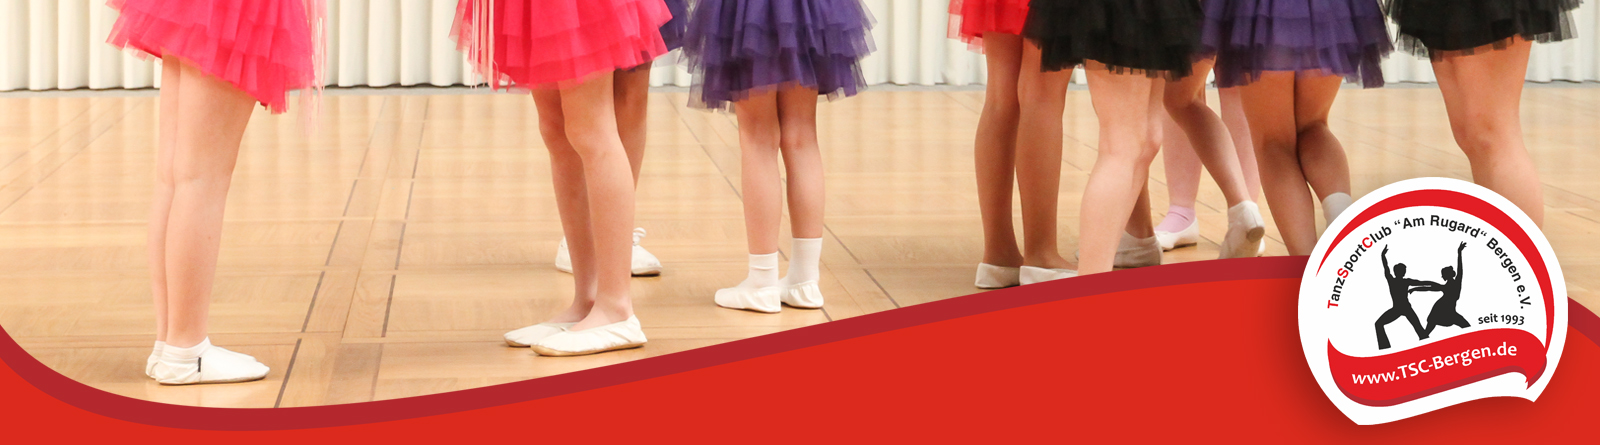 Dance Contest Göhren TSC